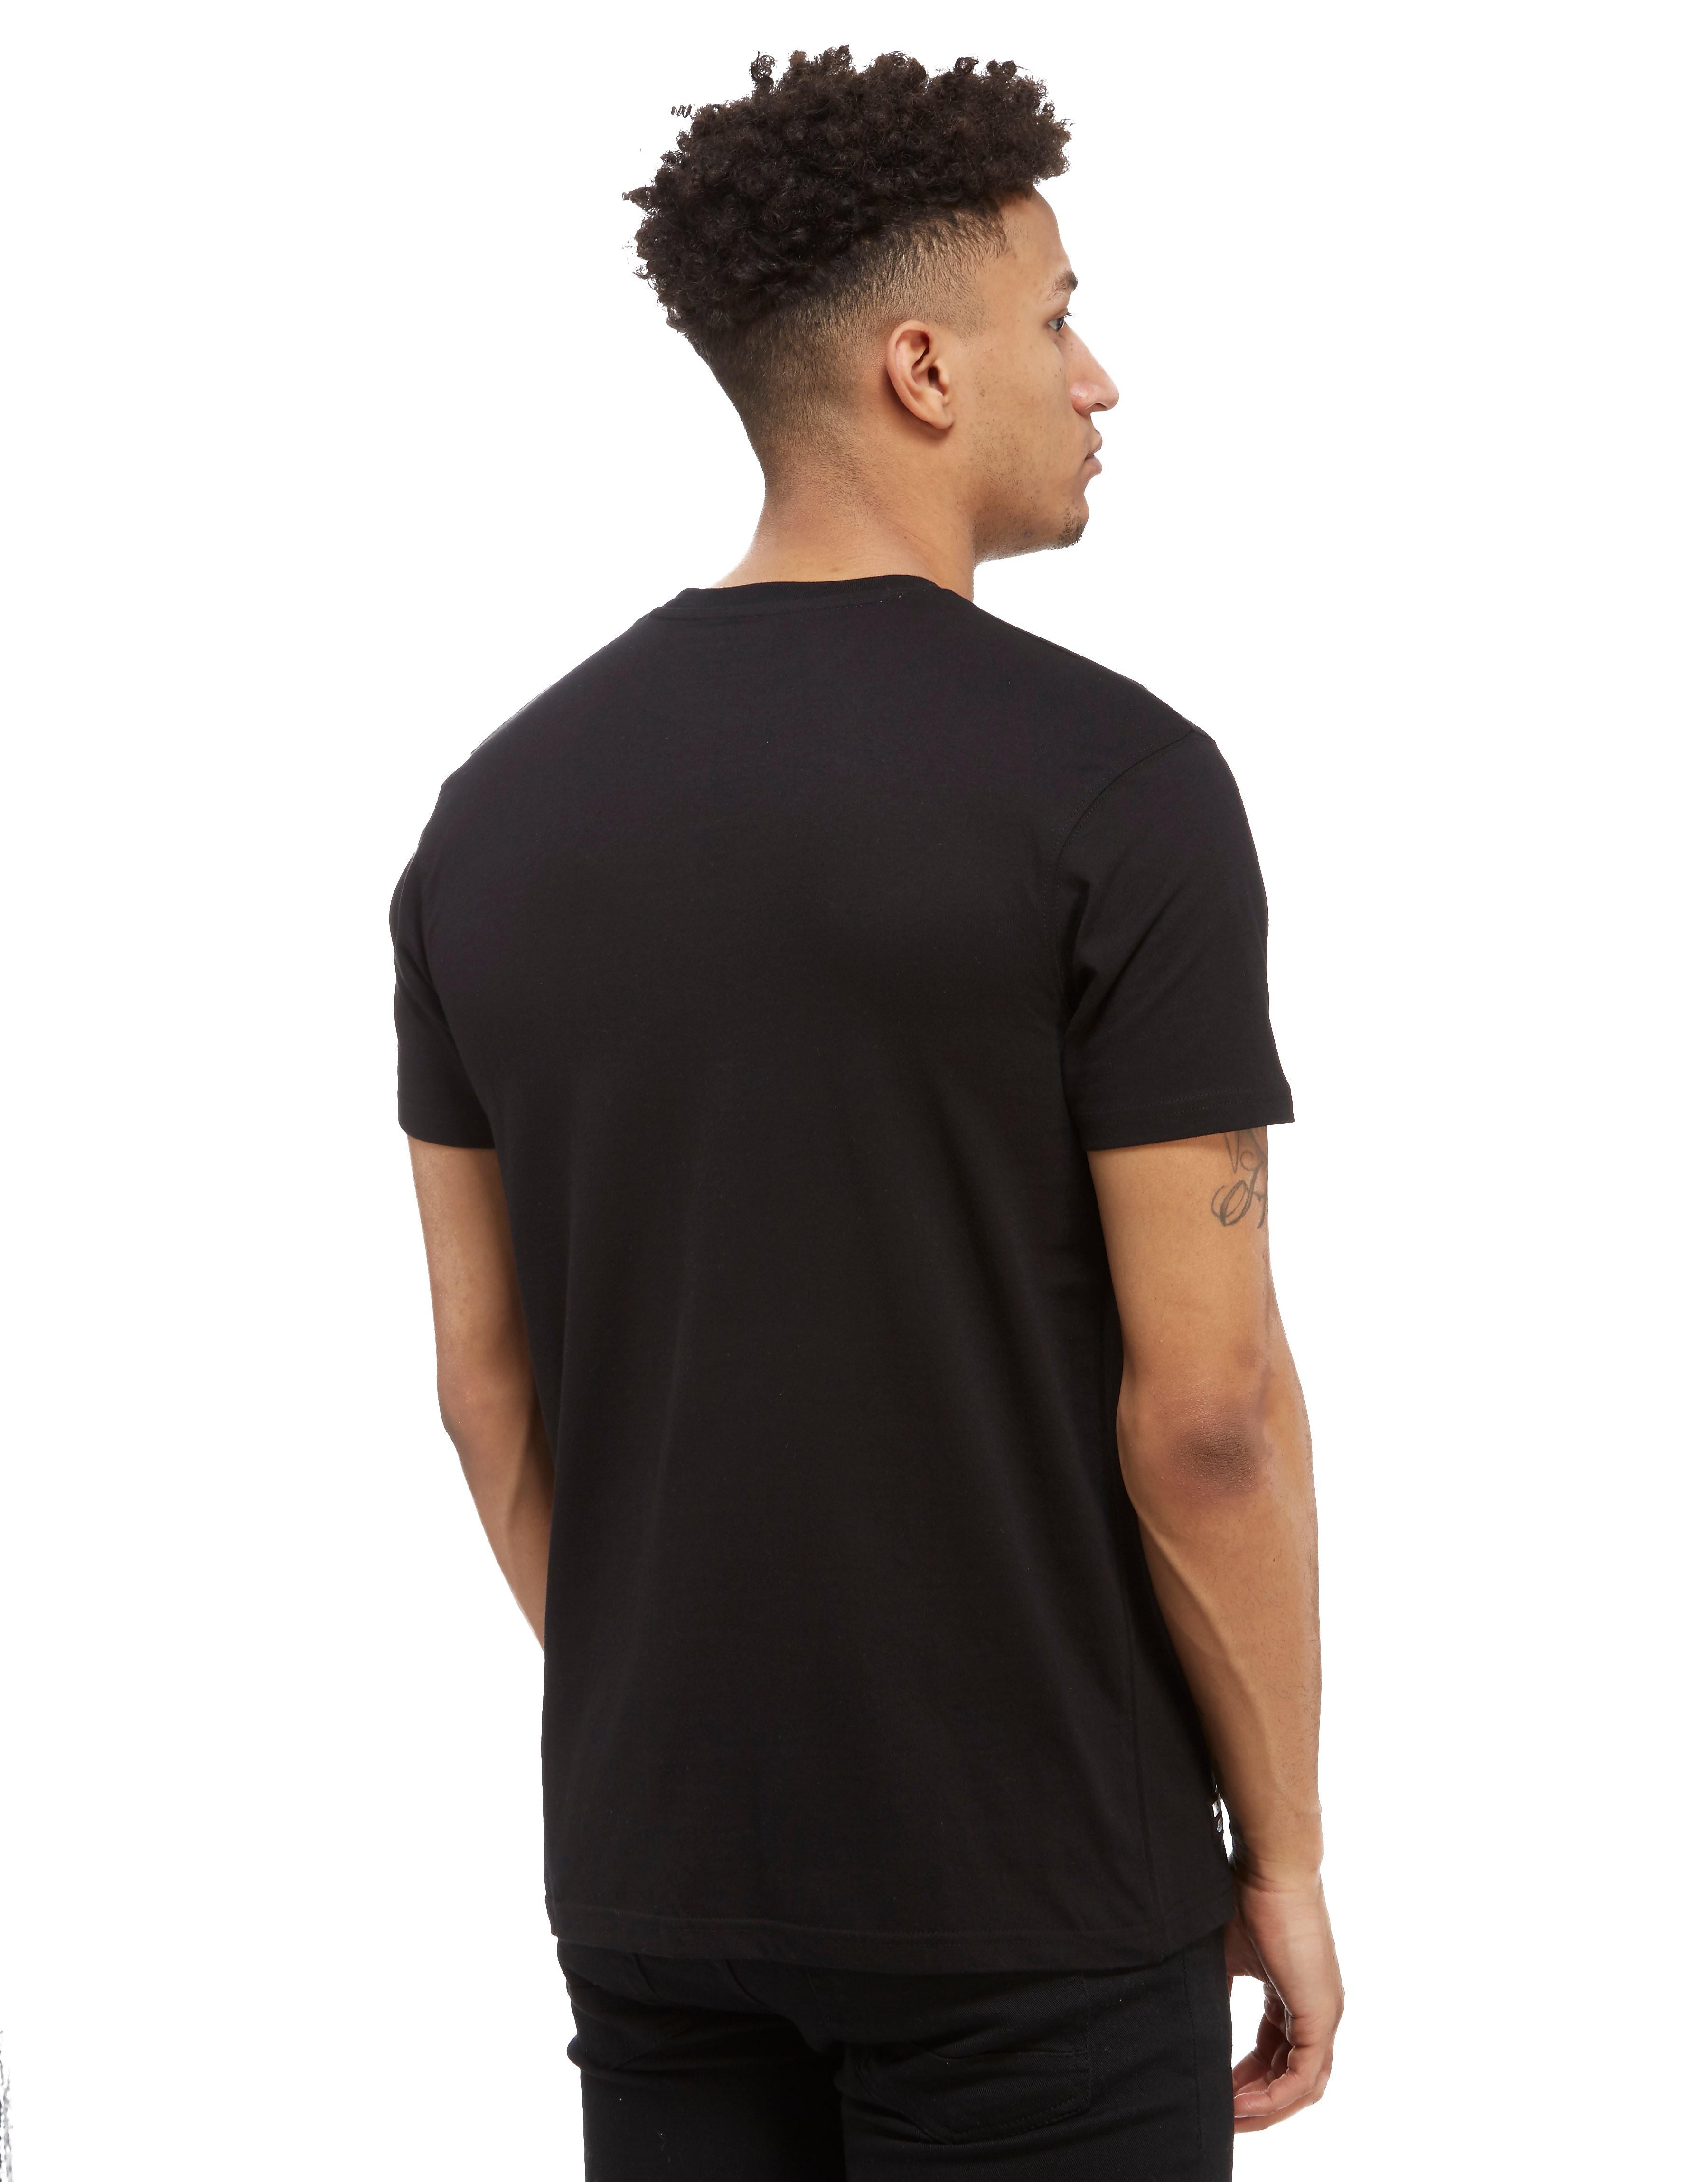 McKenzie Deneside T-Shirt